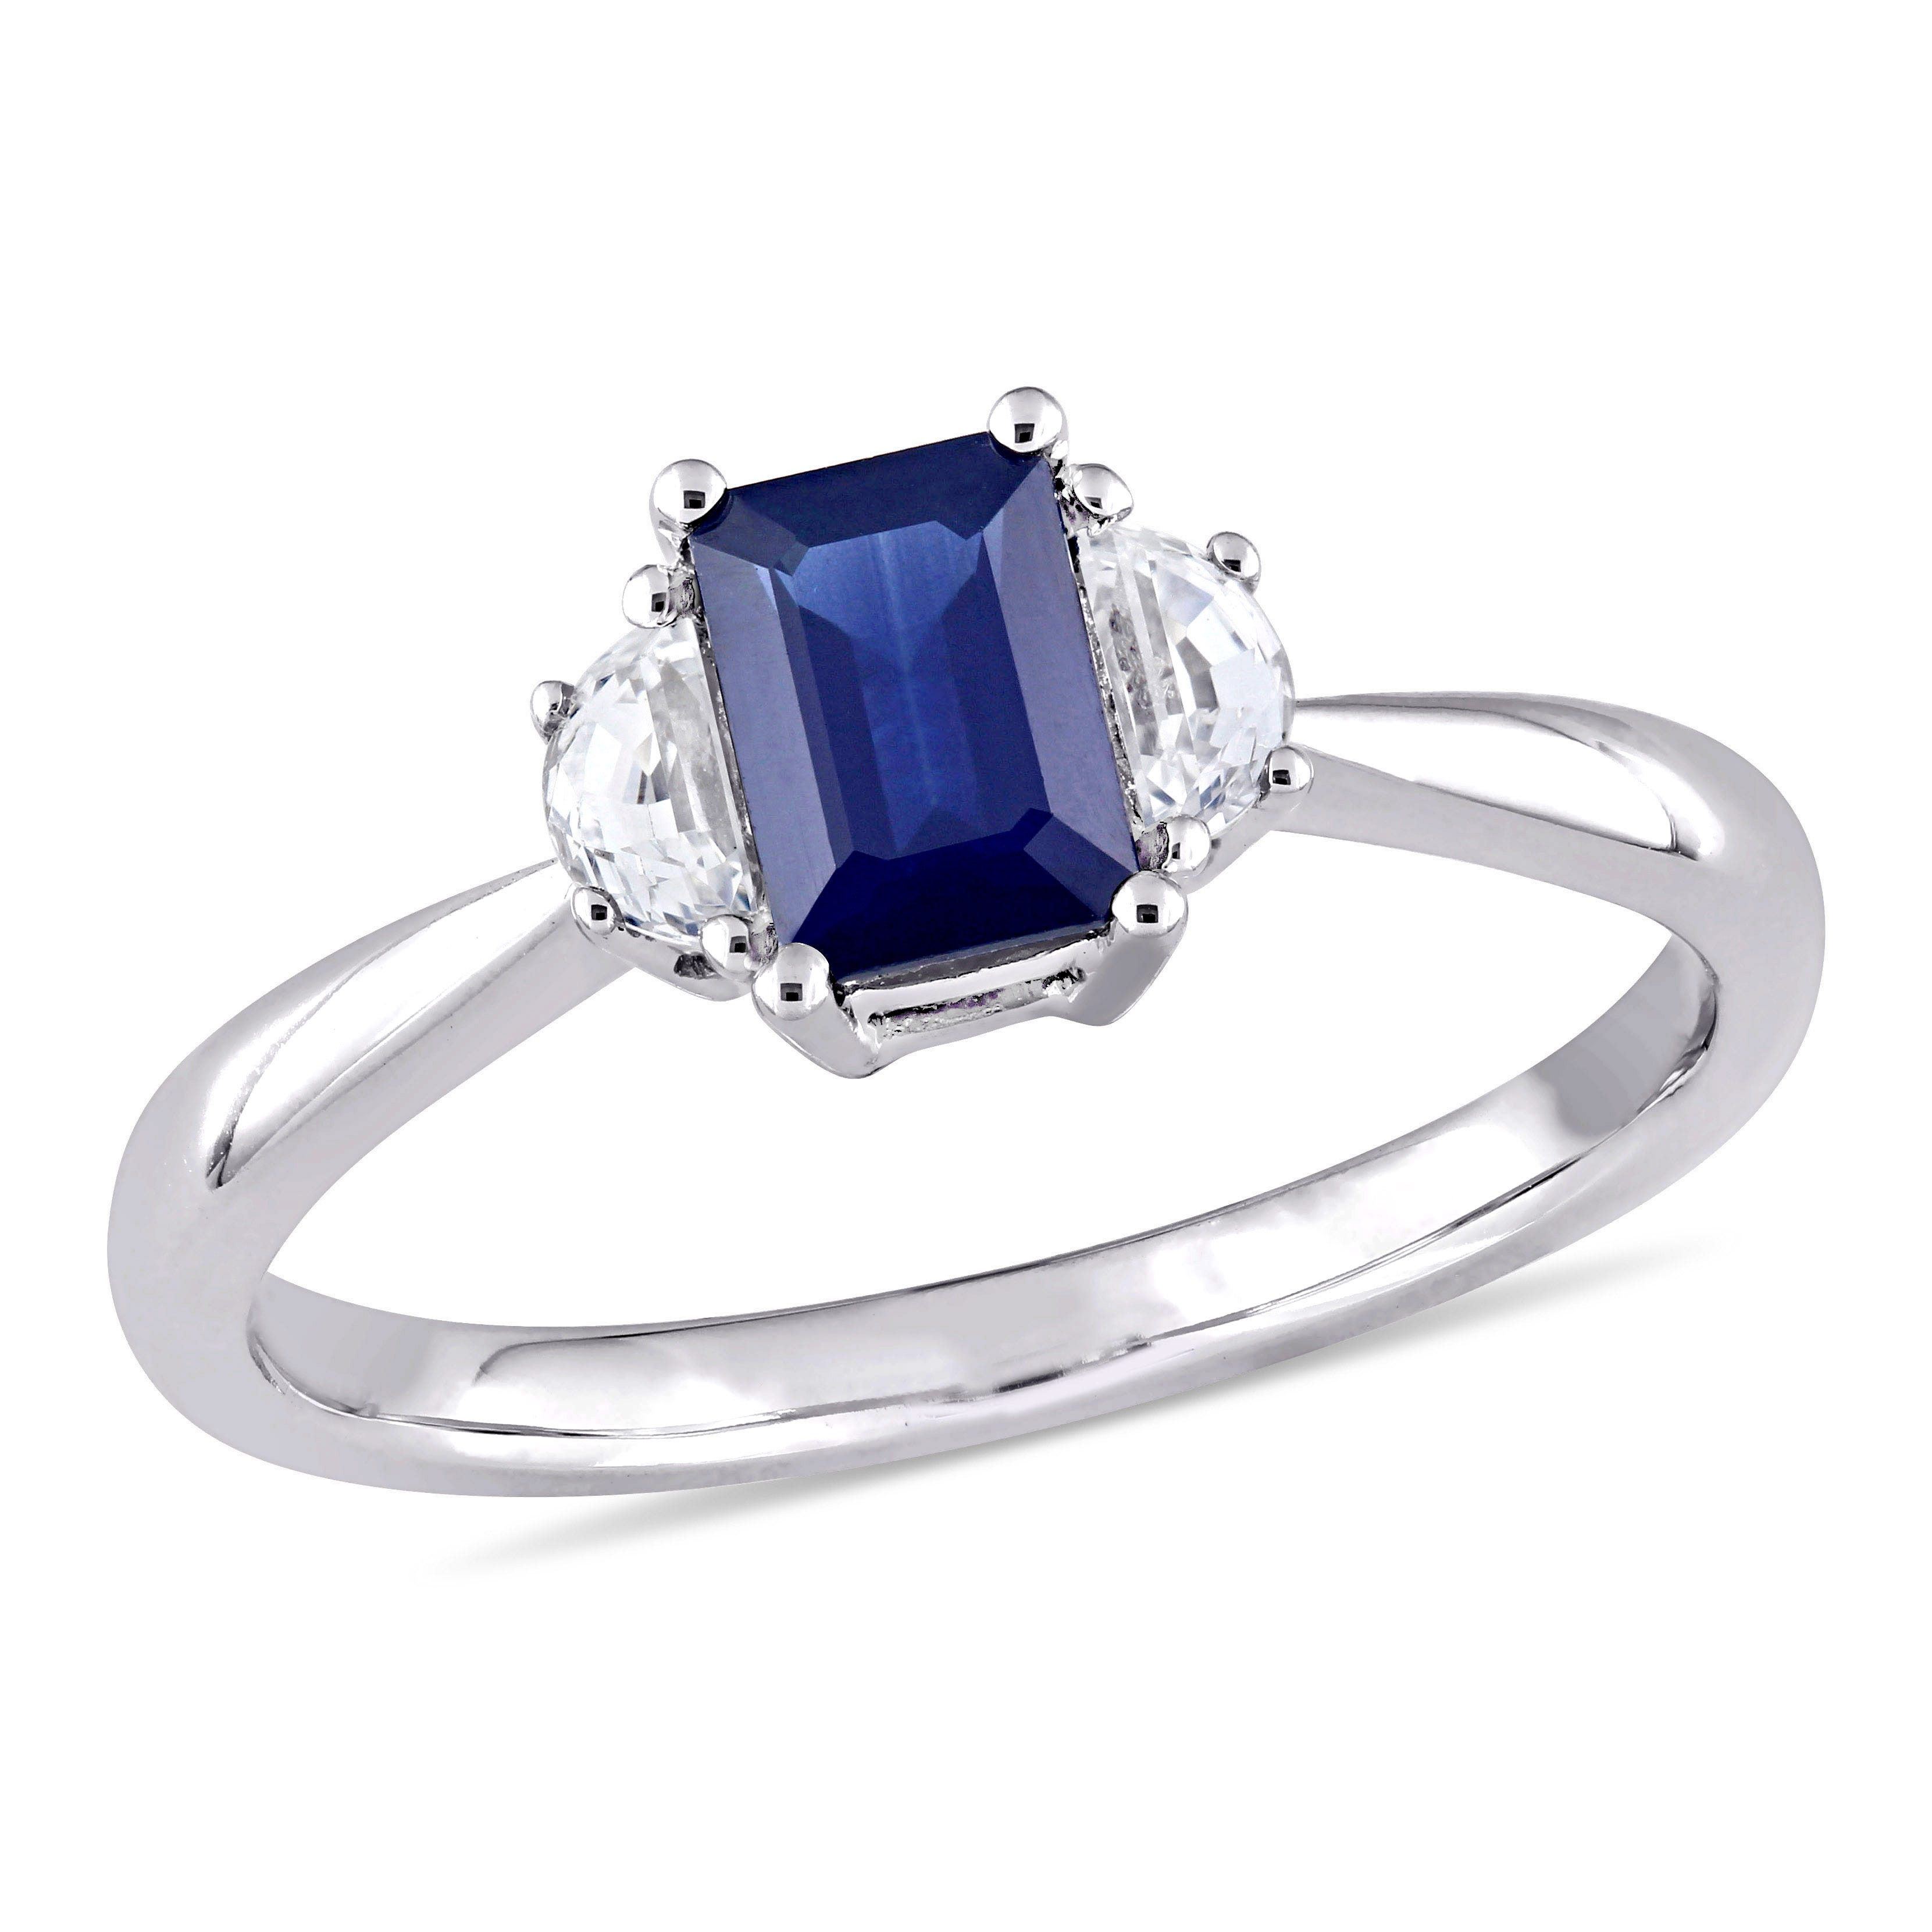 Three-Stone Emerald-Cut & Half Moon Sapphire Engagement Ring in 14k White Gold